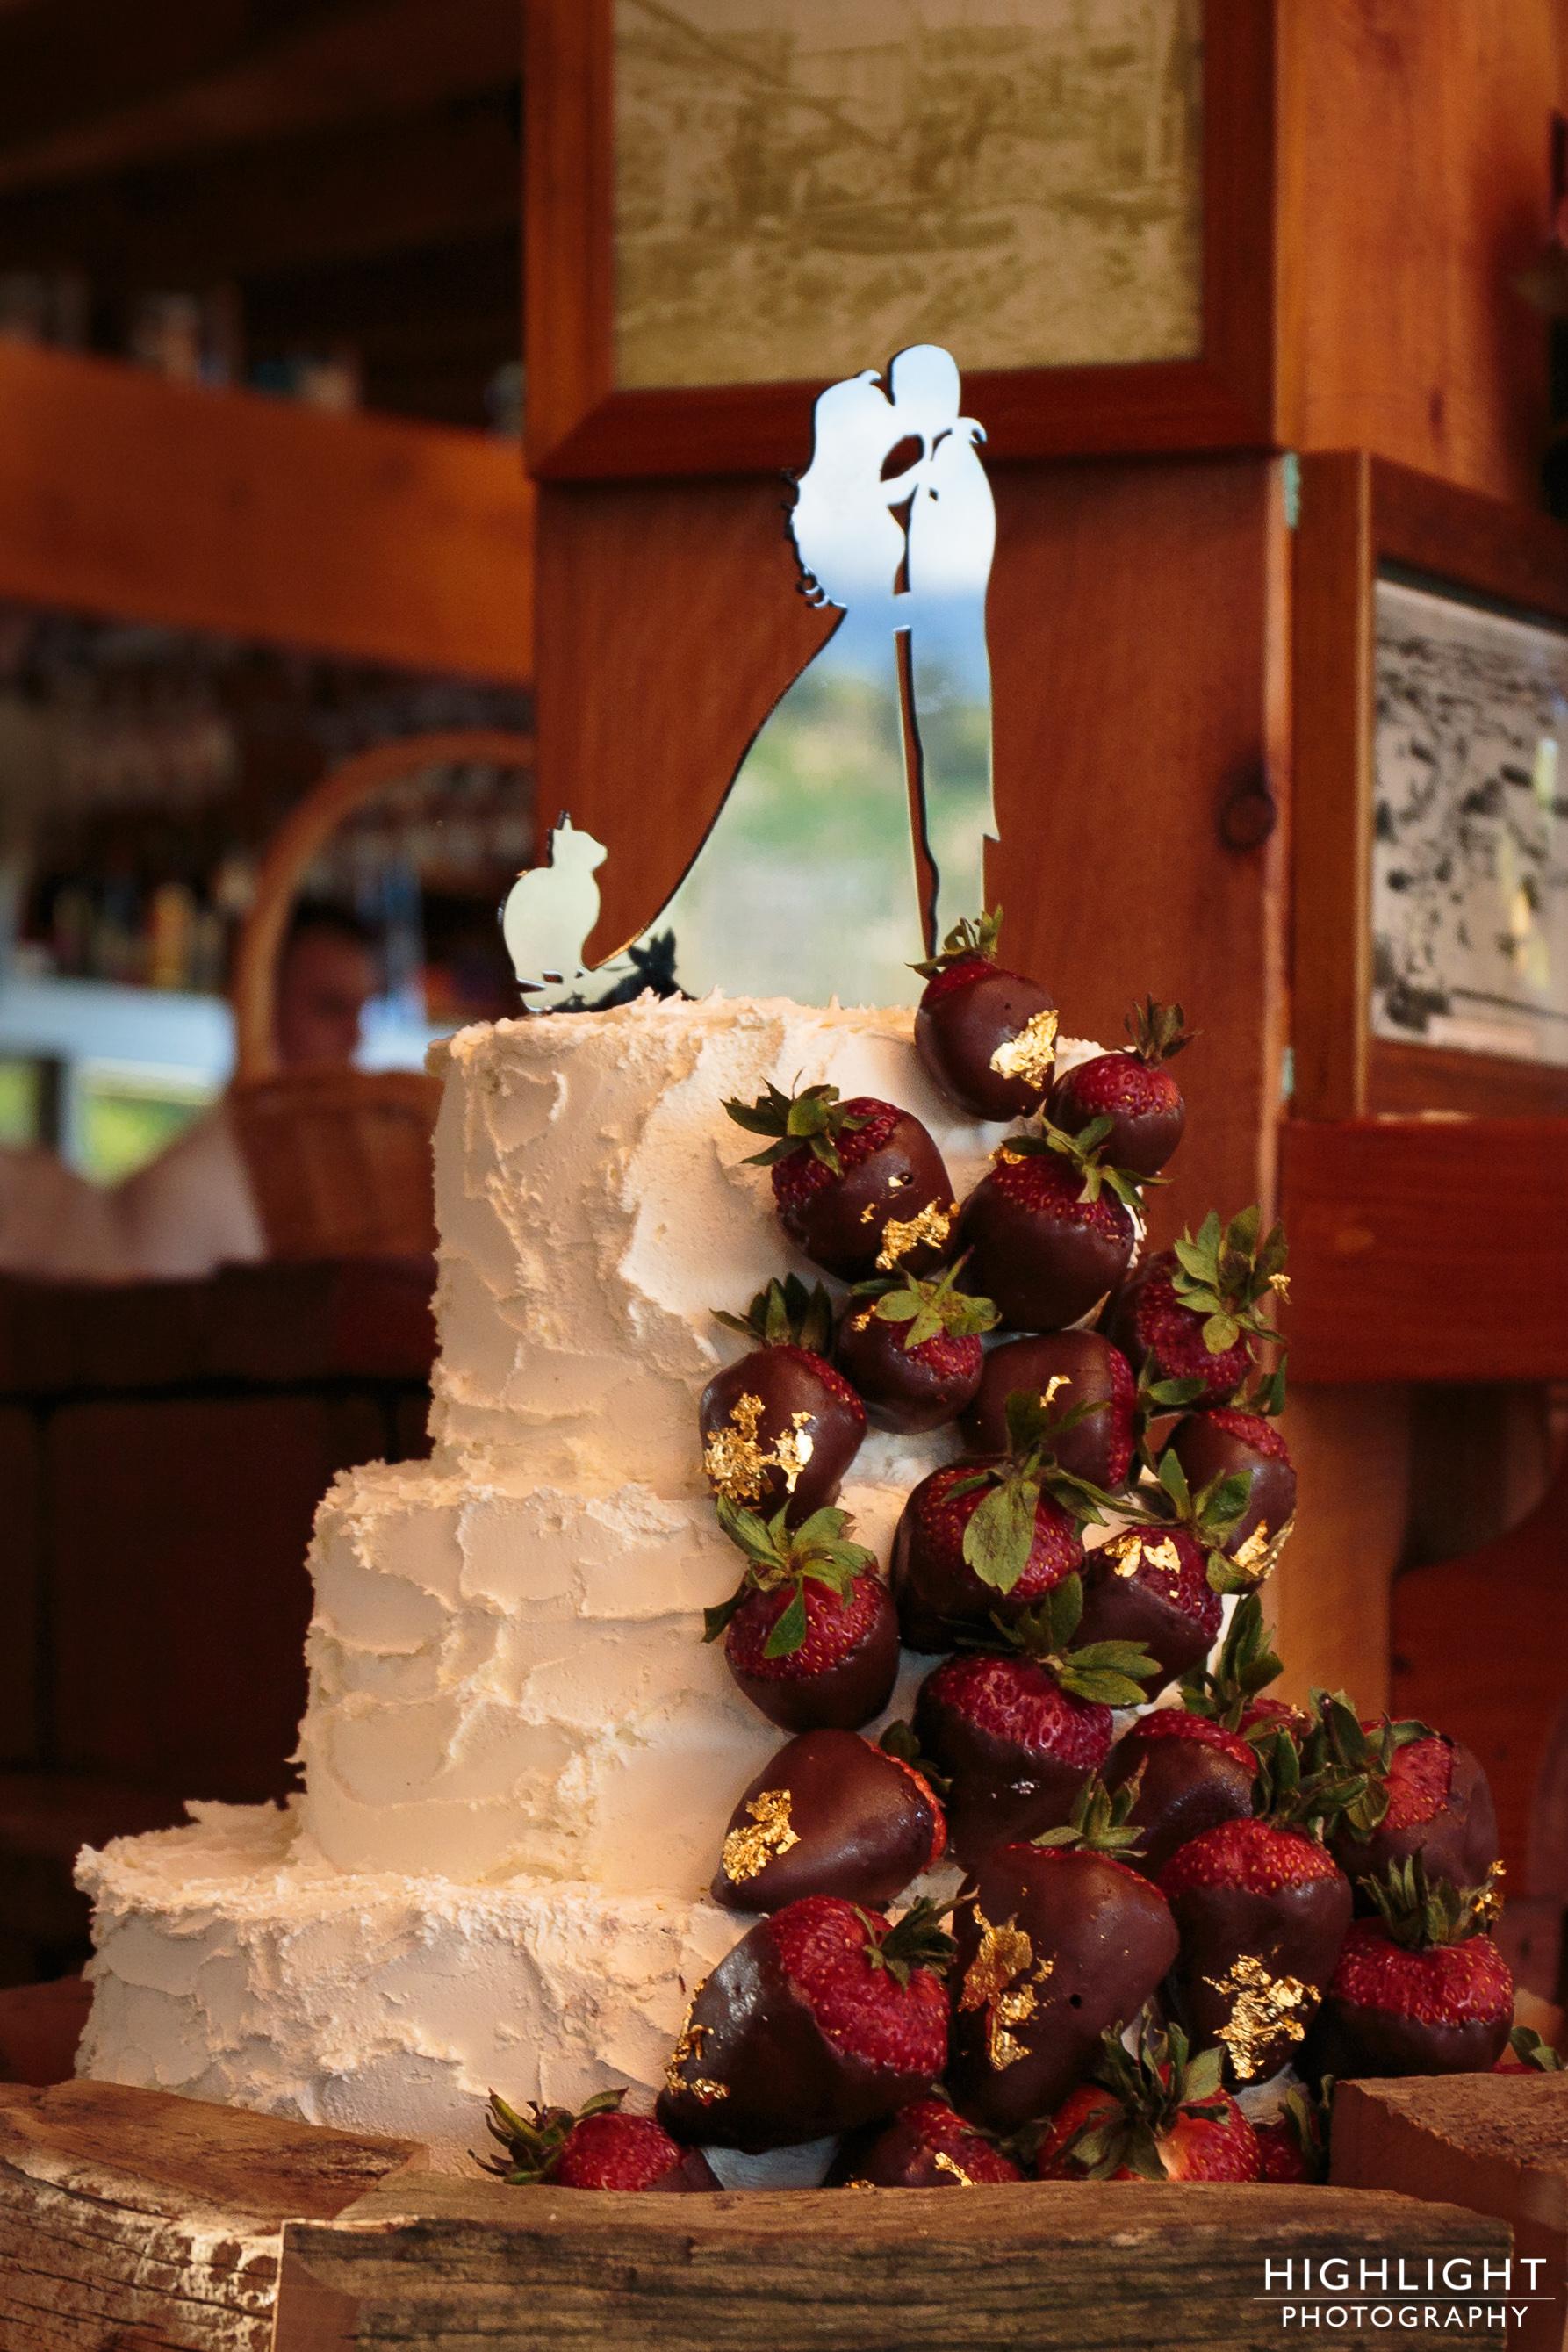 highlight-wedding-photography-new-zealand-makoura-lodge-wedding-150.jpg